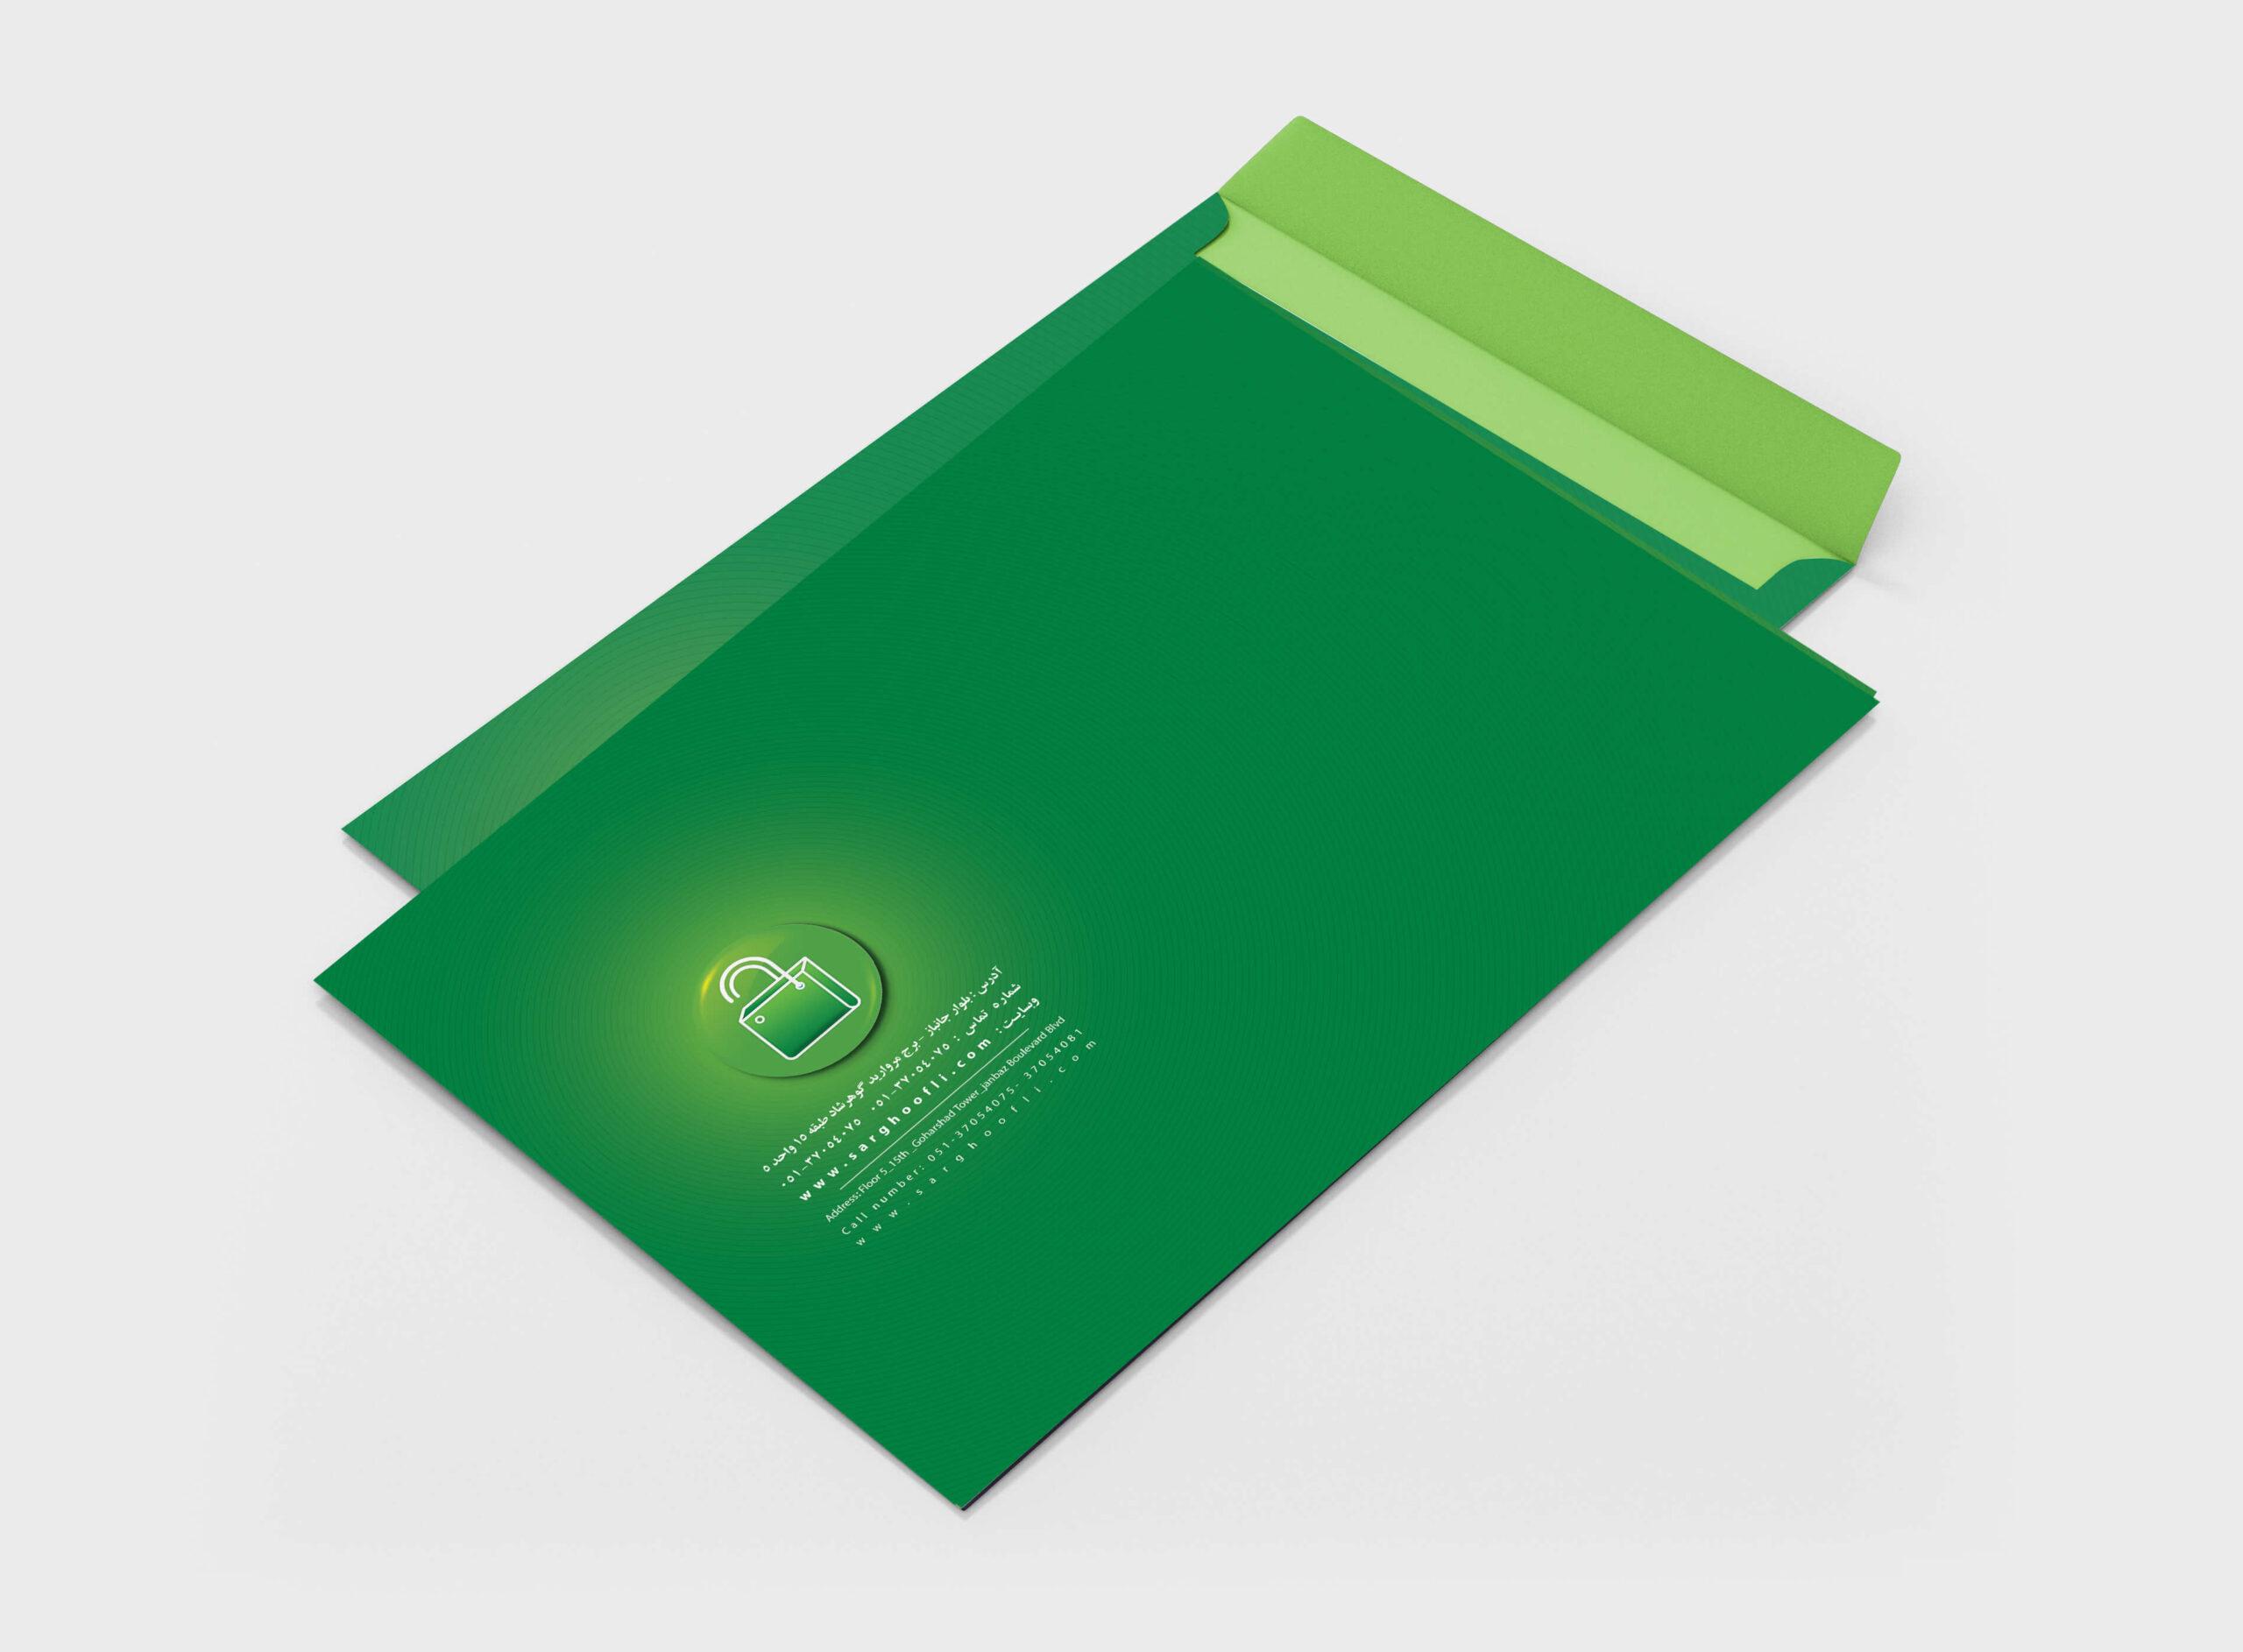 sarghofli Makan brand visual identity design-4